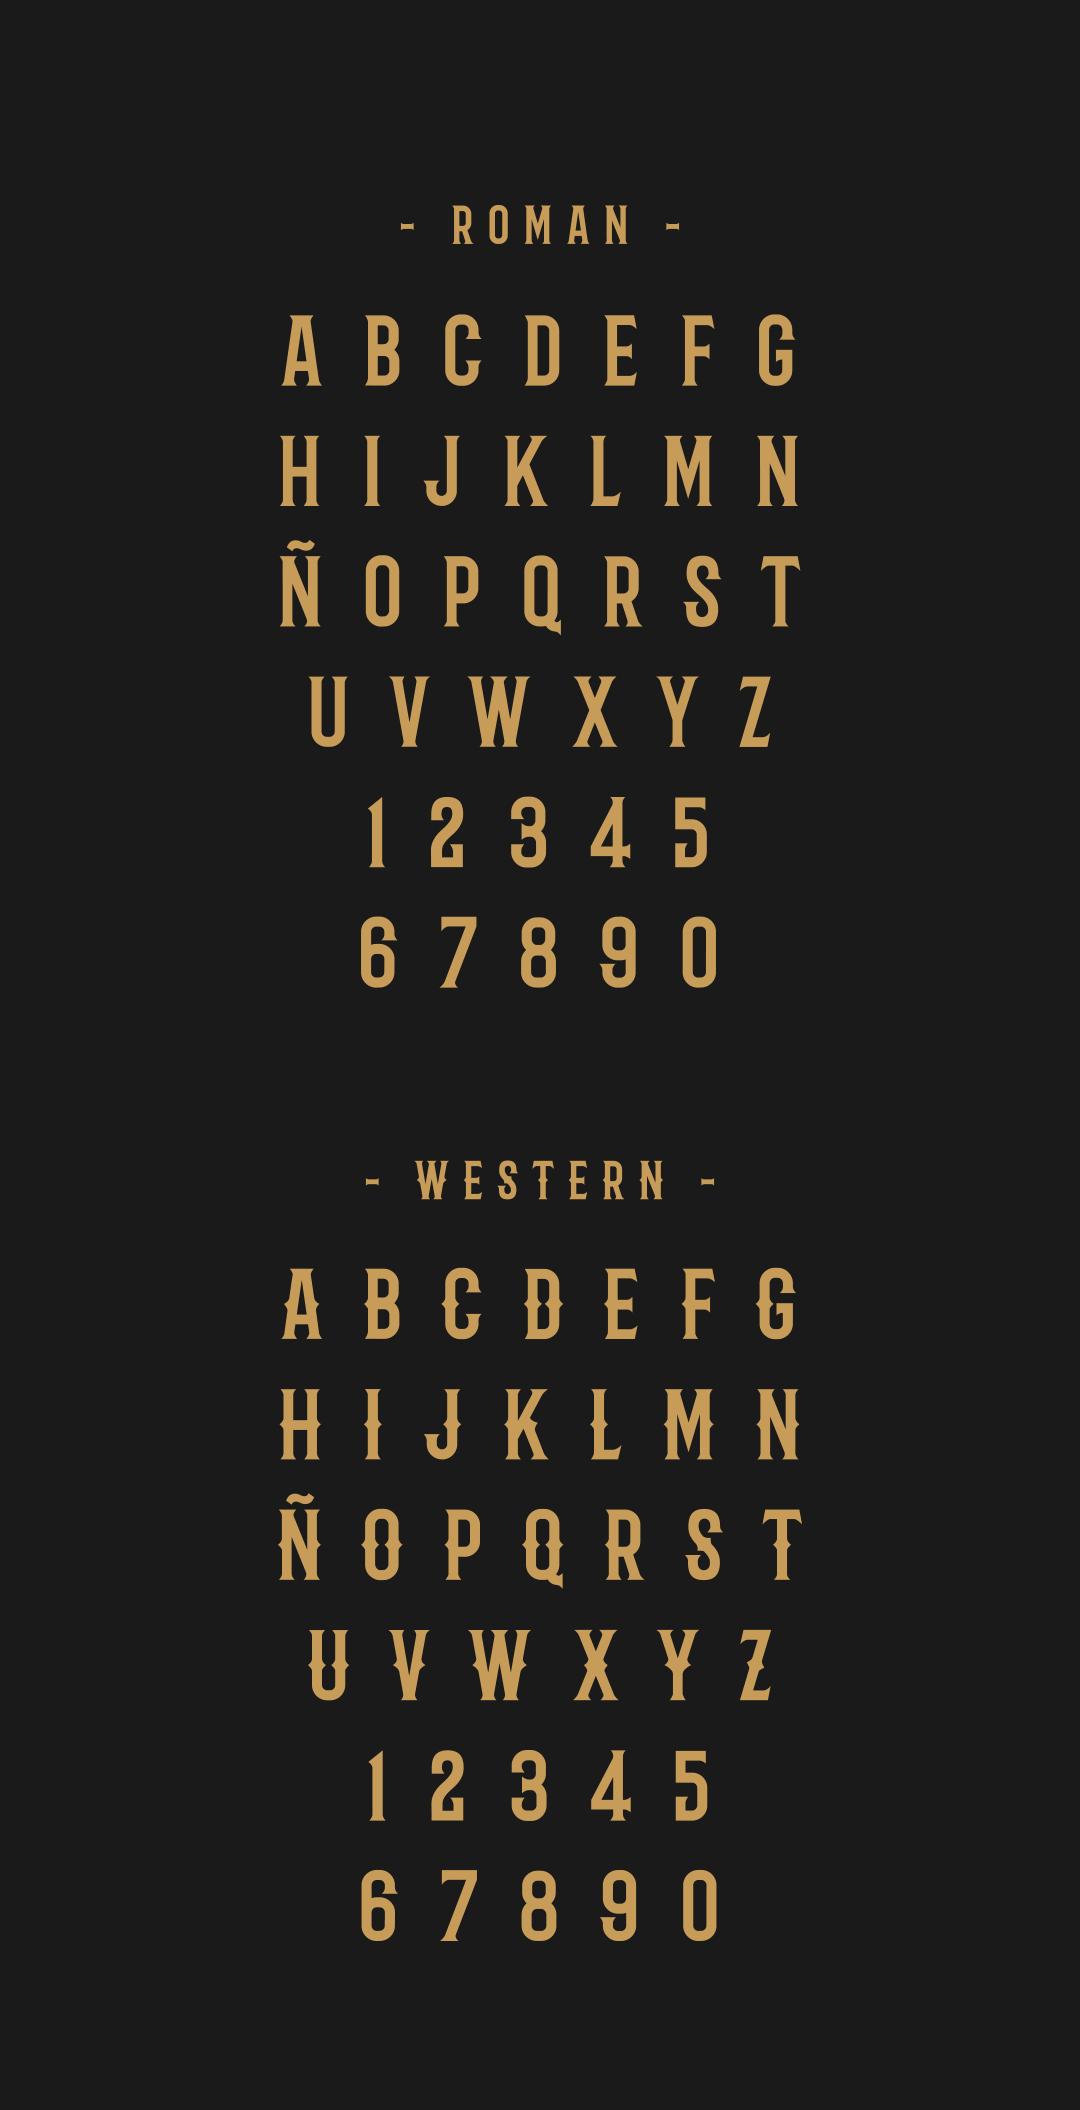 font freefont free serif type tipografia gratis dominican Republic santodomingo  santo Domingo western lettering barbaro